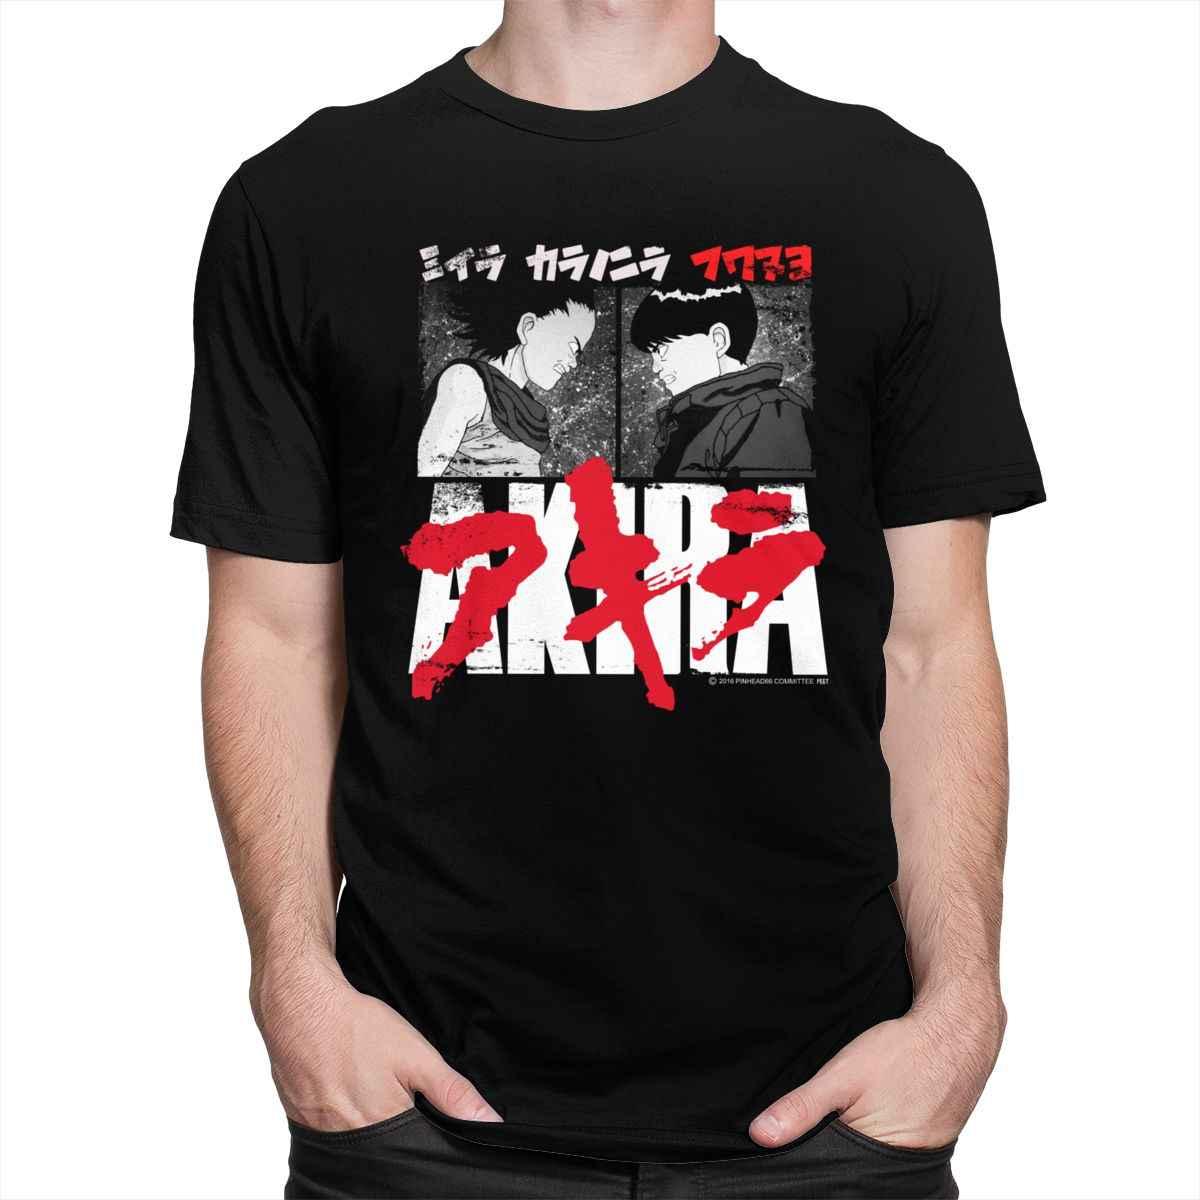 Akira Tetsuo Kaneda Manga Neo Tokyo Anime Unisex Tshirt T-Shirt Tee ALL SIZES